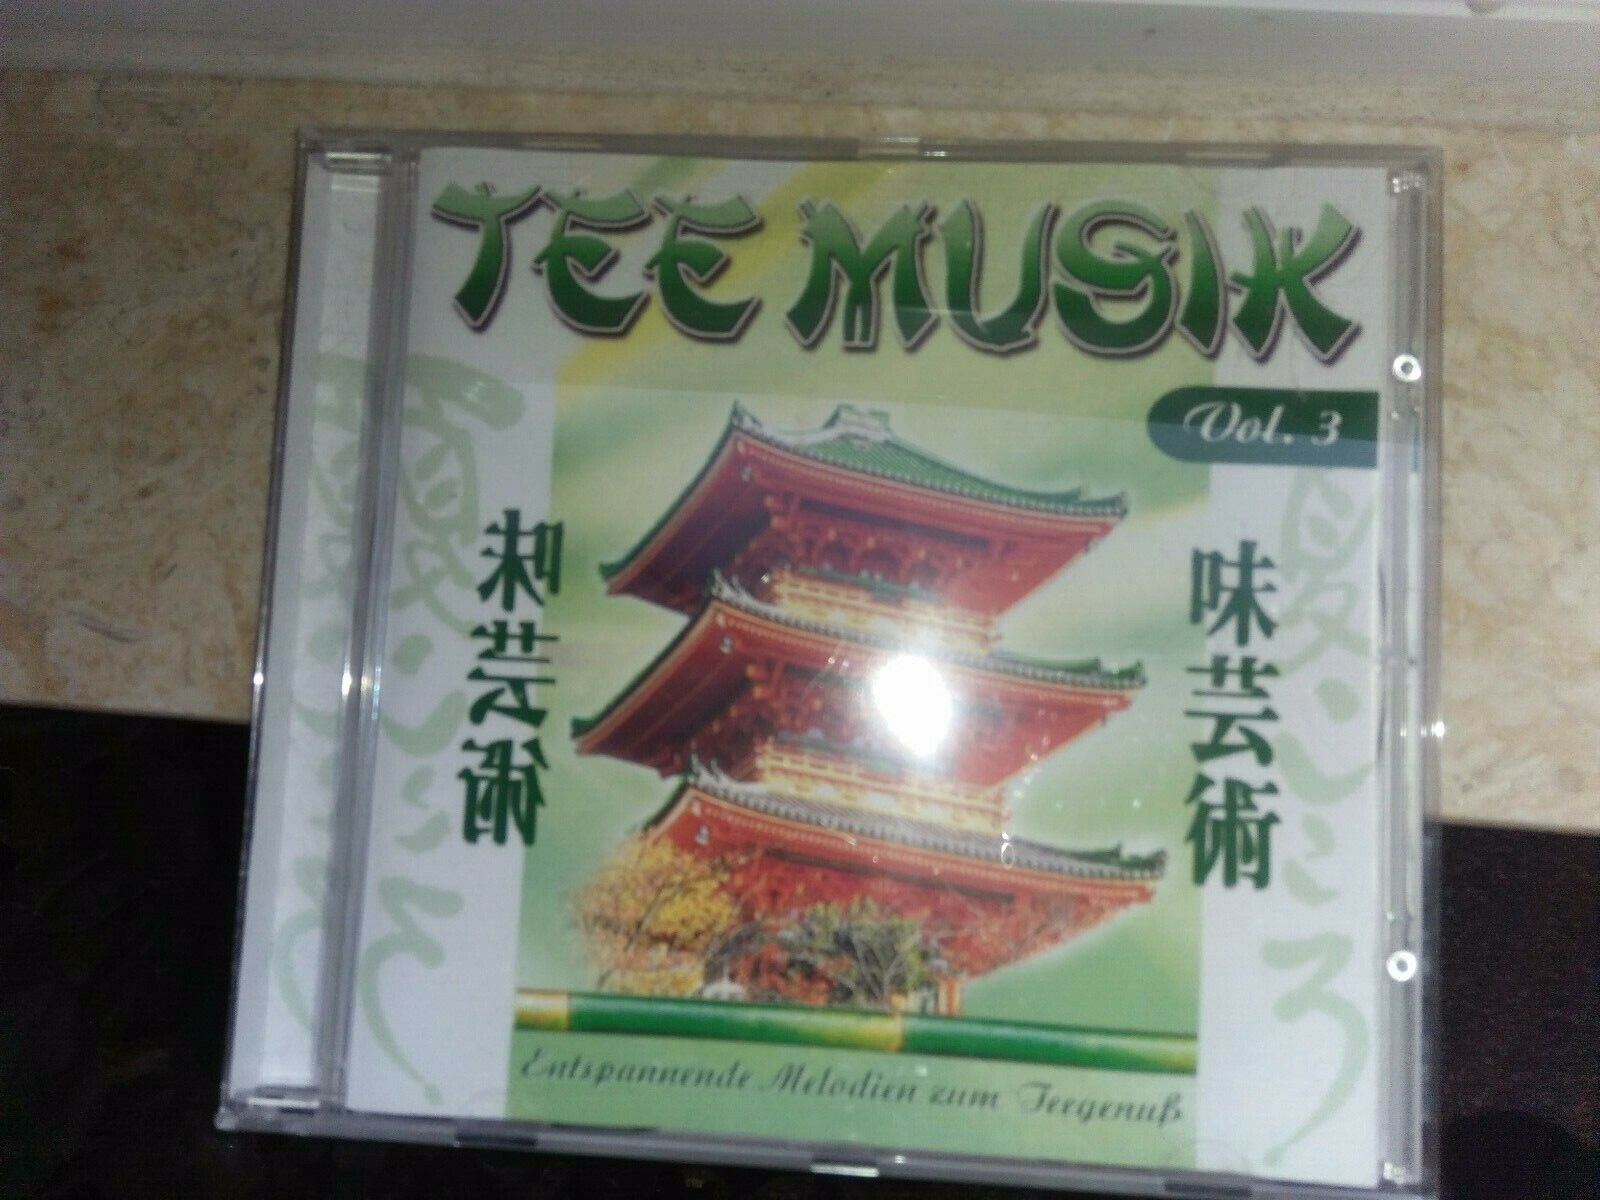 CD entspannung meditation zusammenstellung meditativer Chill Out Tee Musik